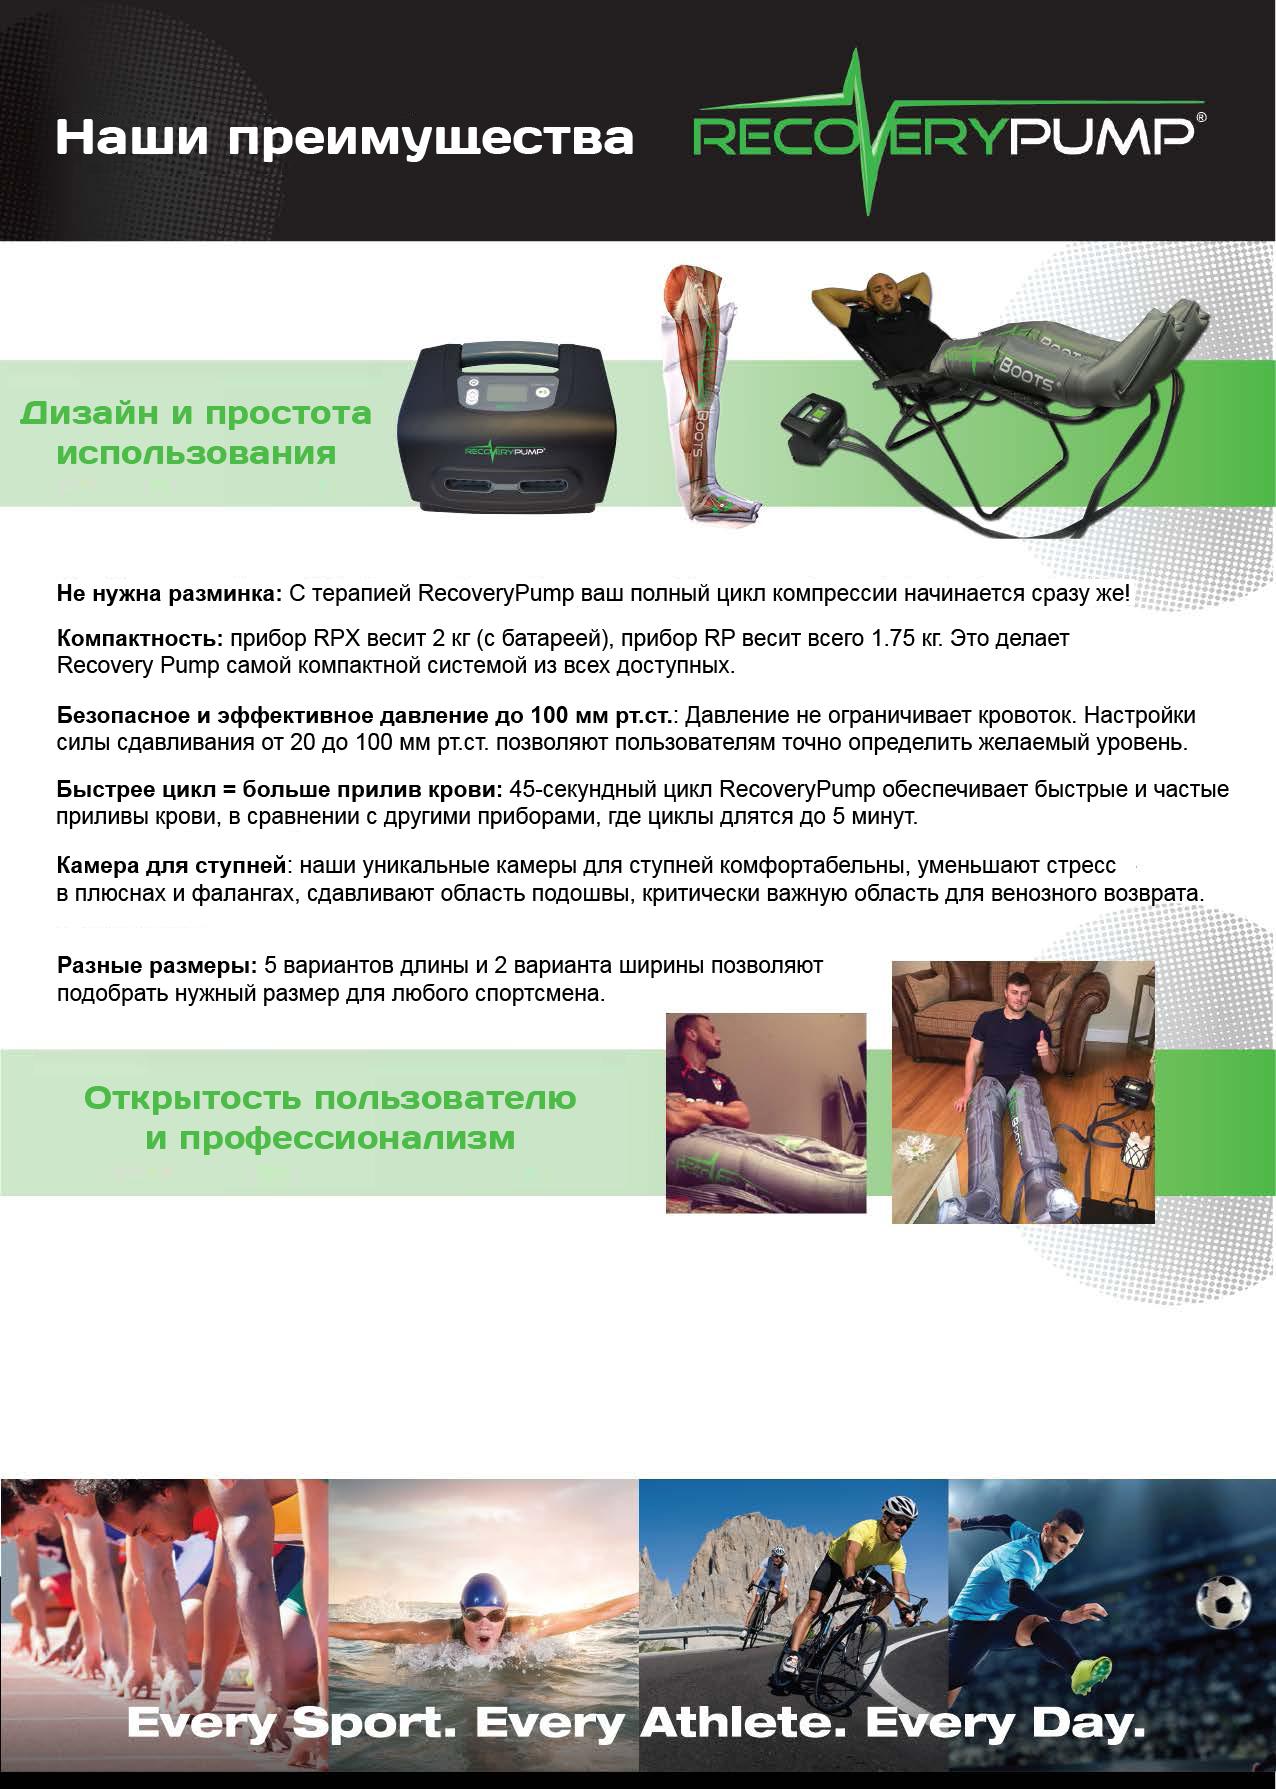 Преимущества системы Recovery Pump